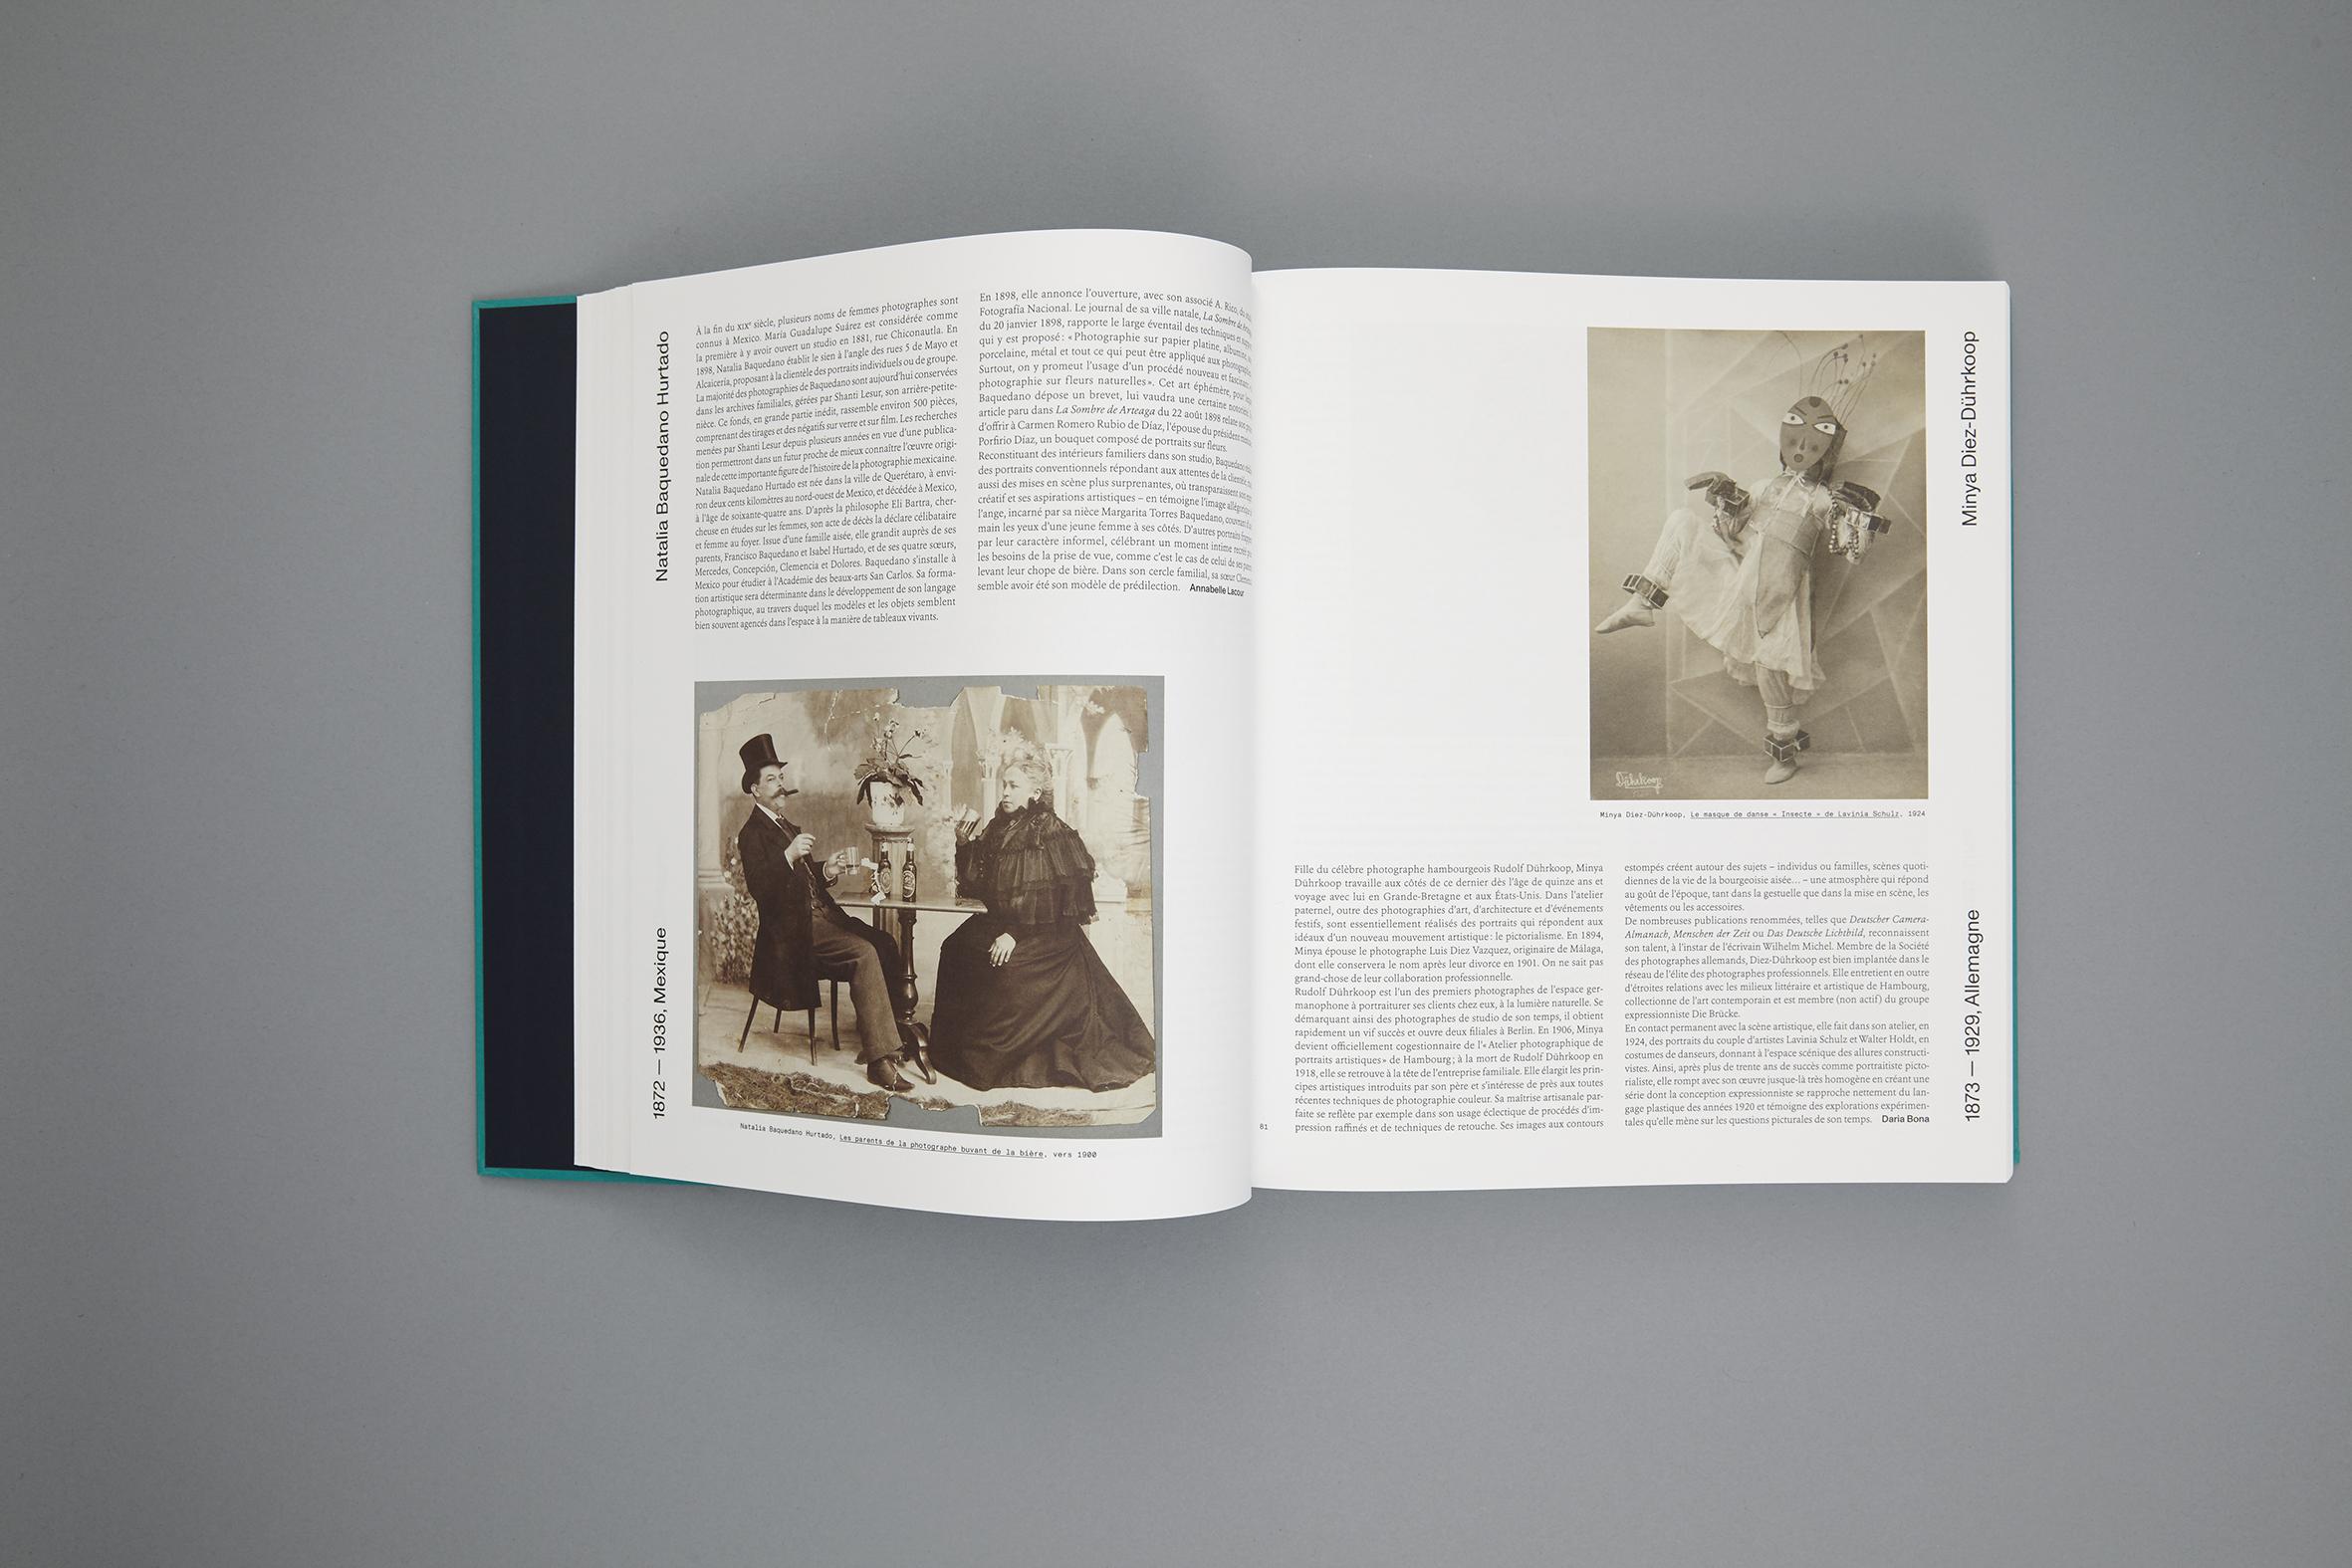 lebart-robert-dahan-histoire-mondiale-femmes-photographes-delpire-co-2